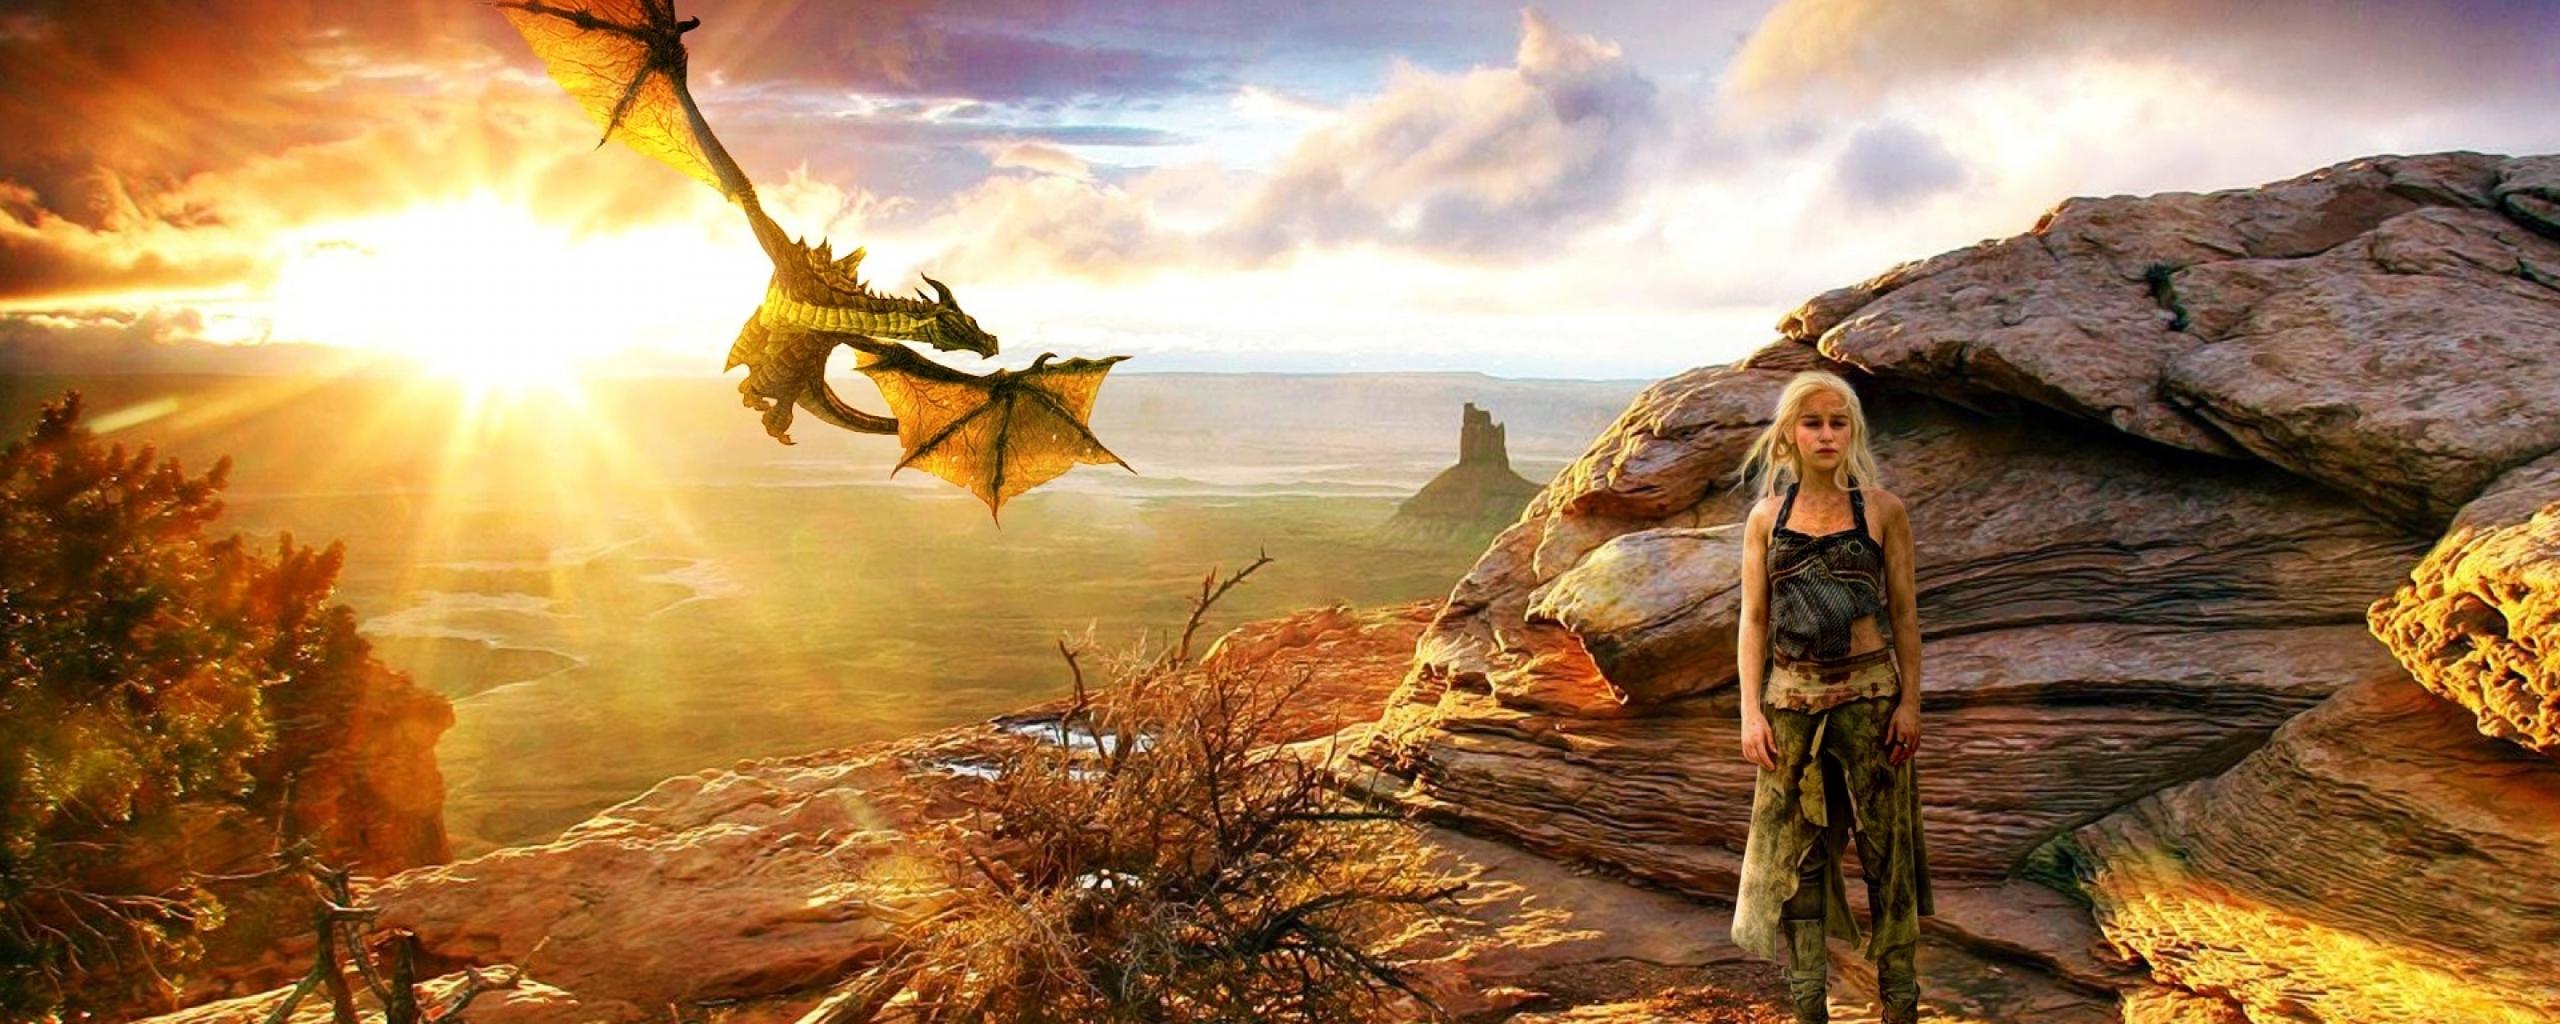 Khaleesi With Dragon Game Of Thrones, Full HD 2K Wallpaper